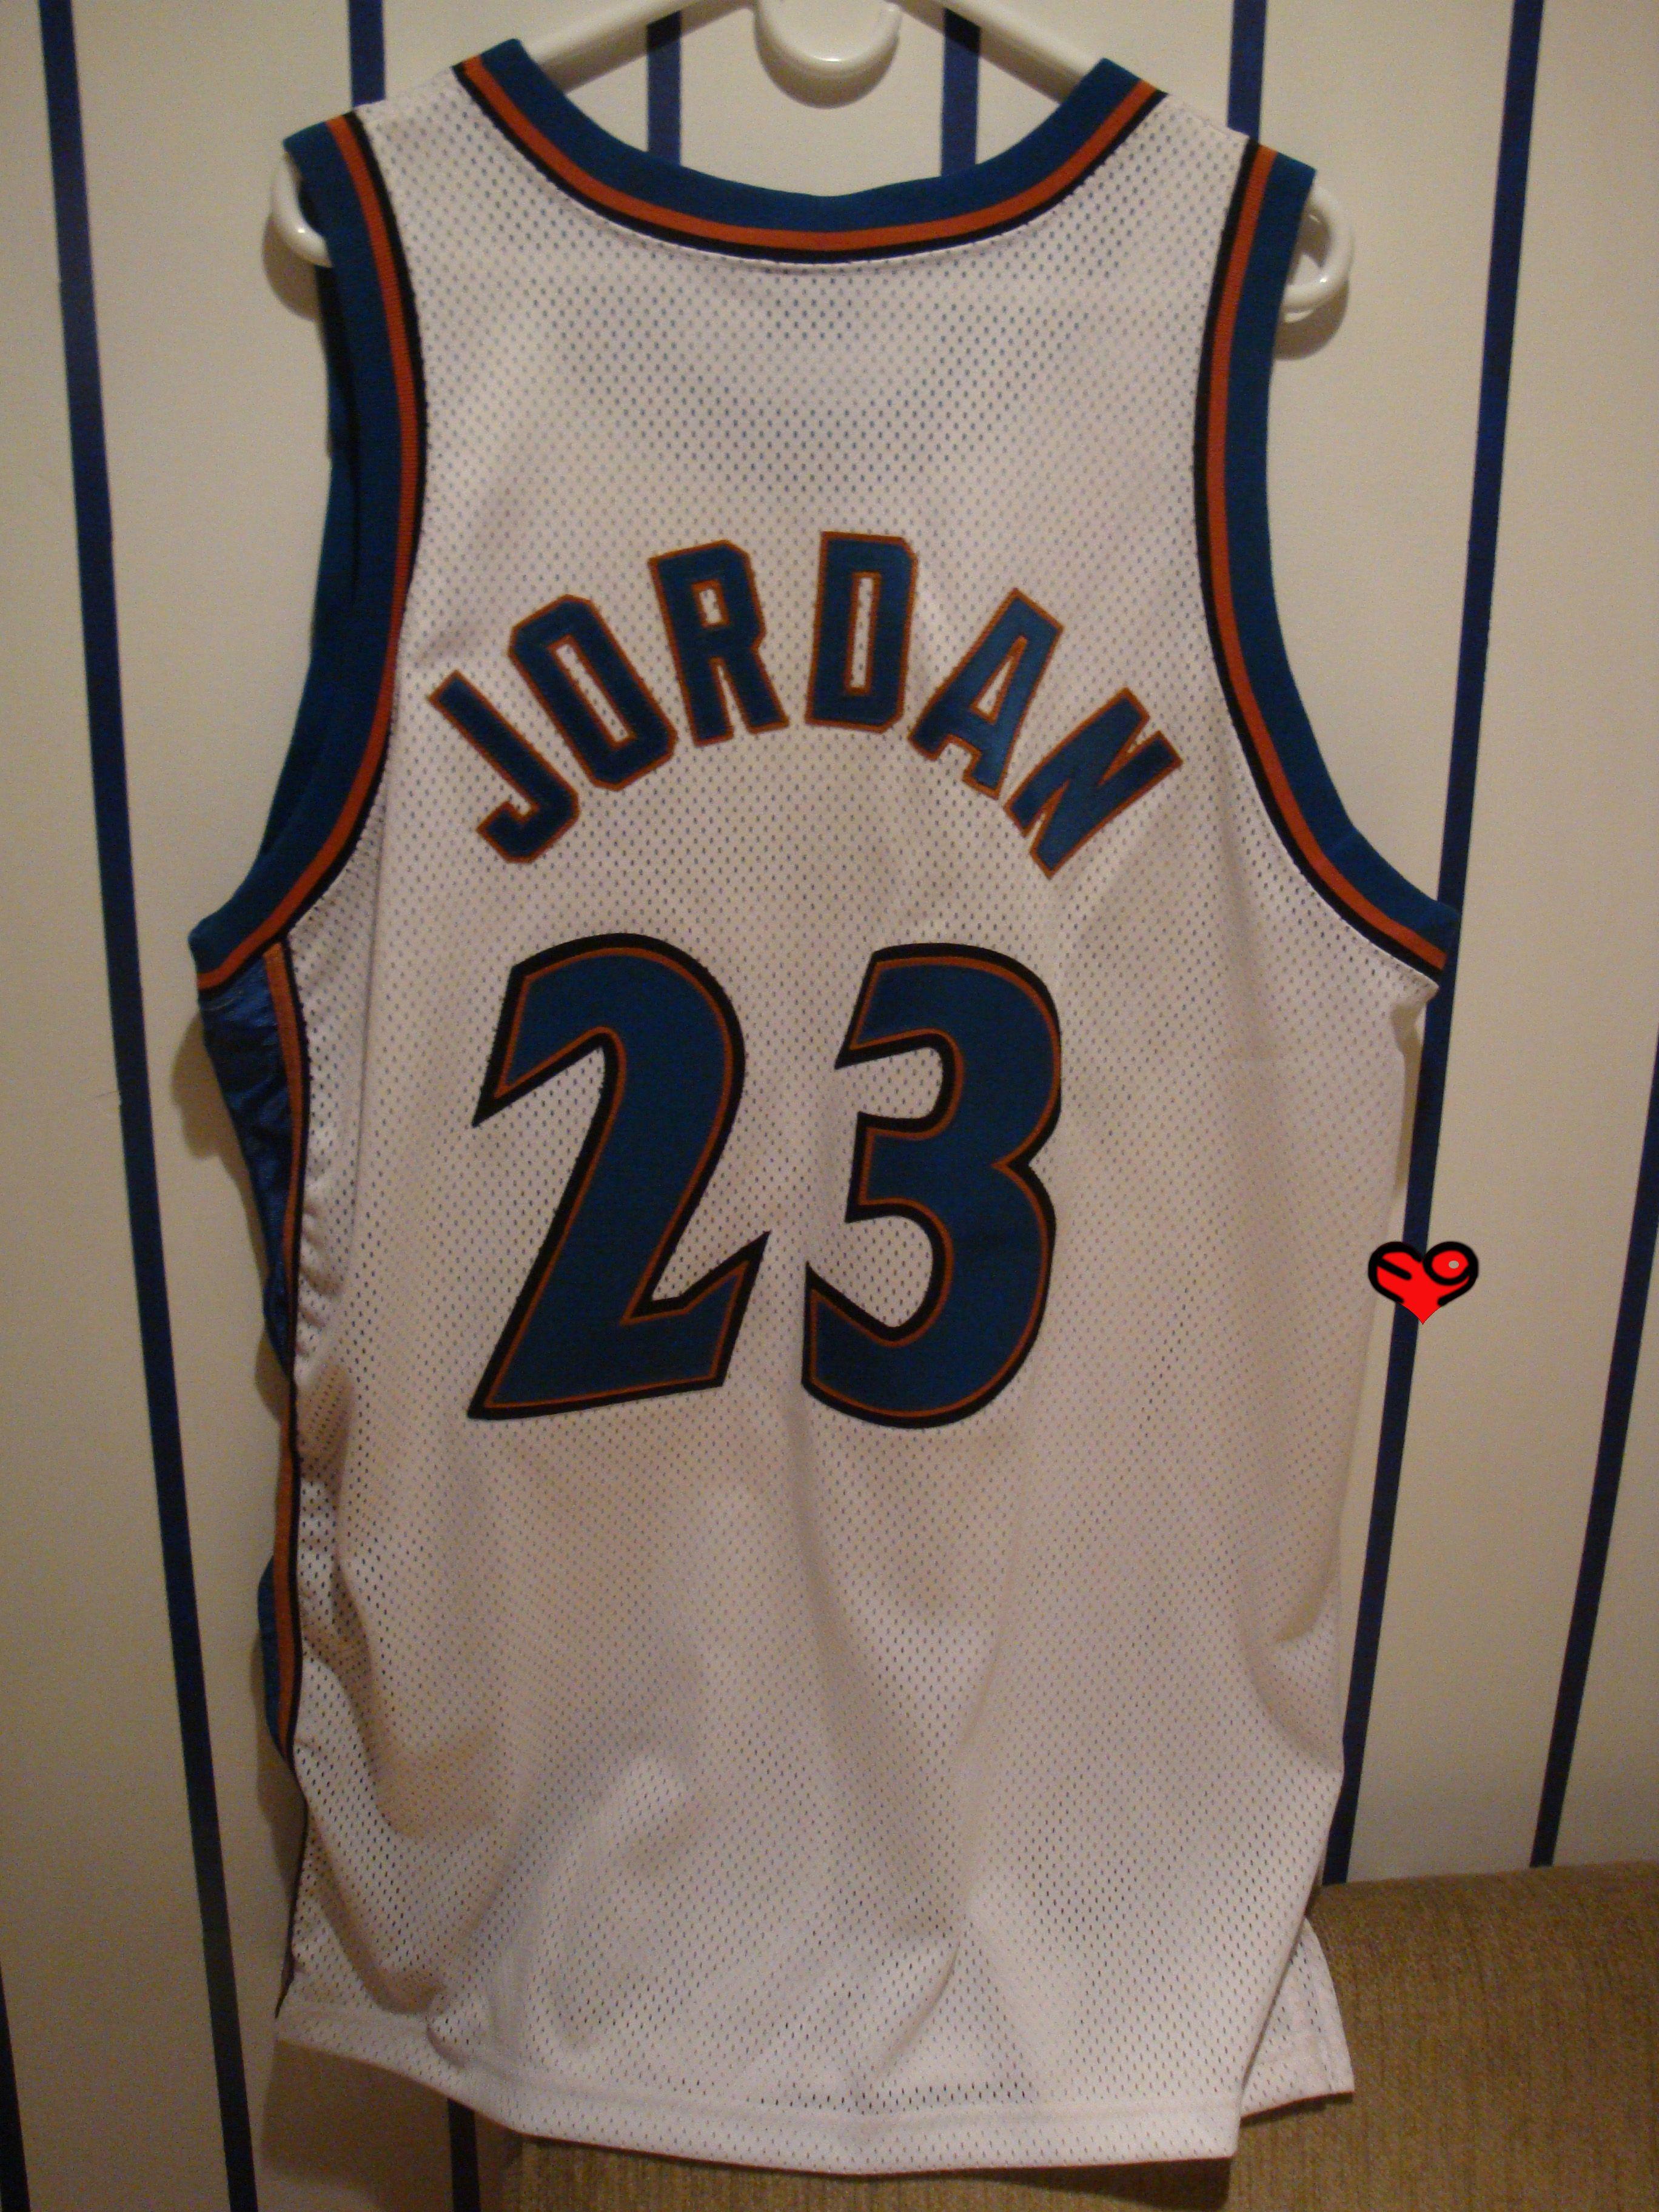 2002 jordan authentic nike wizards home jersey w911